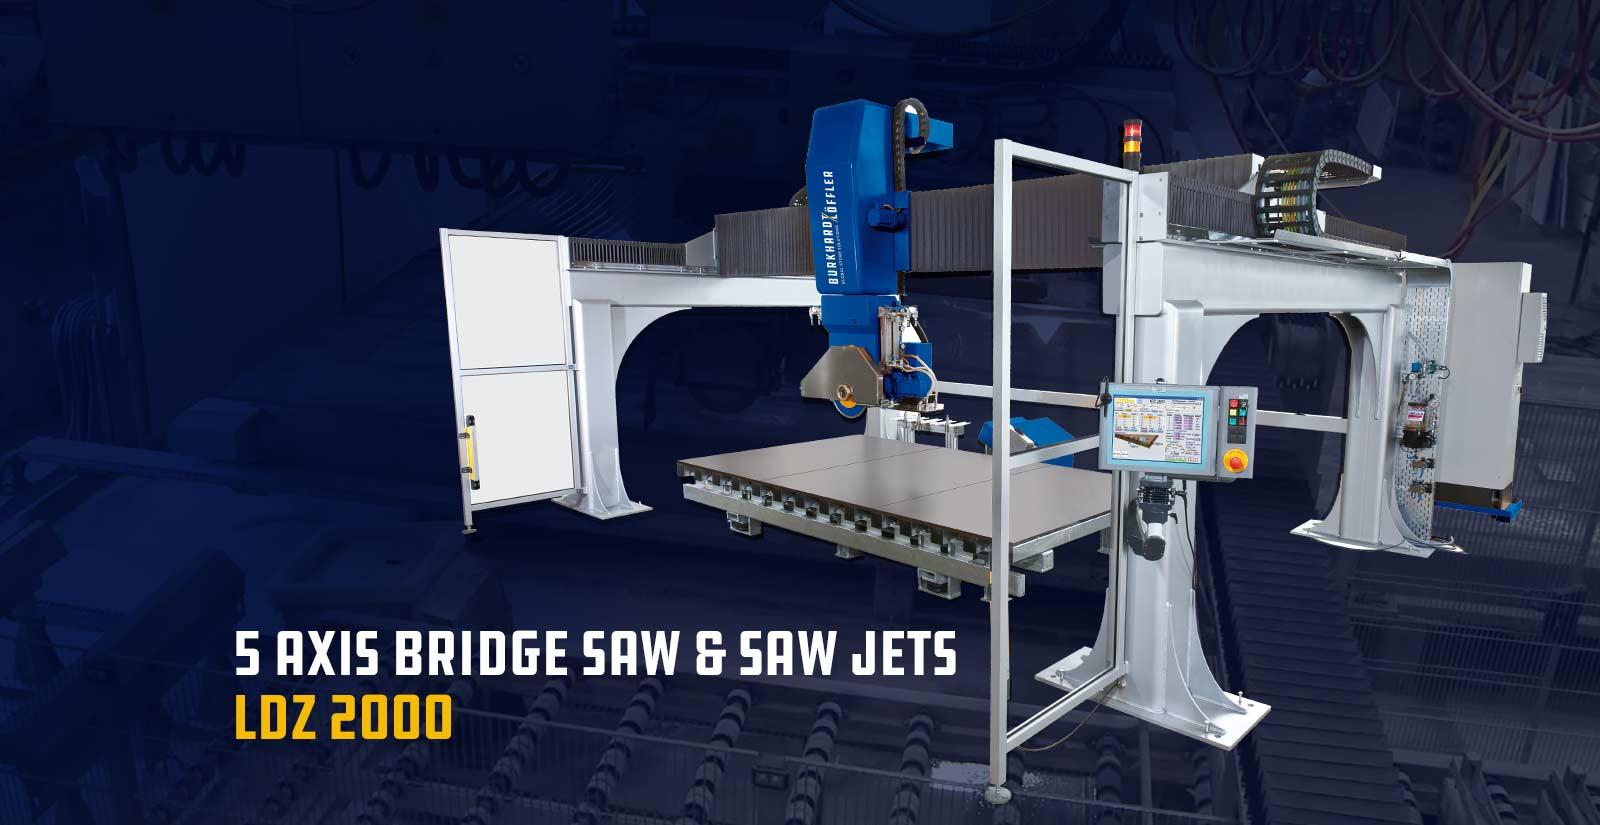 BRIDGE SAW